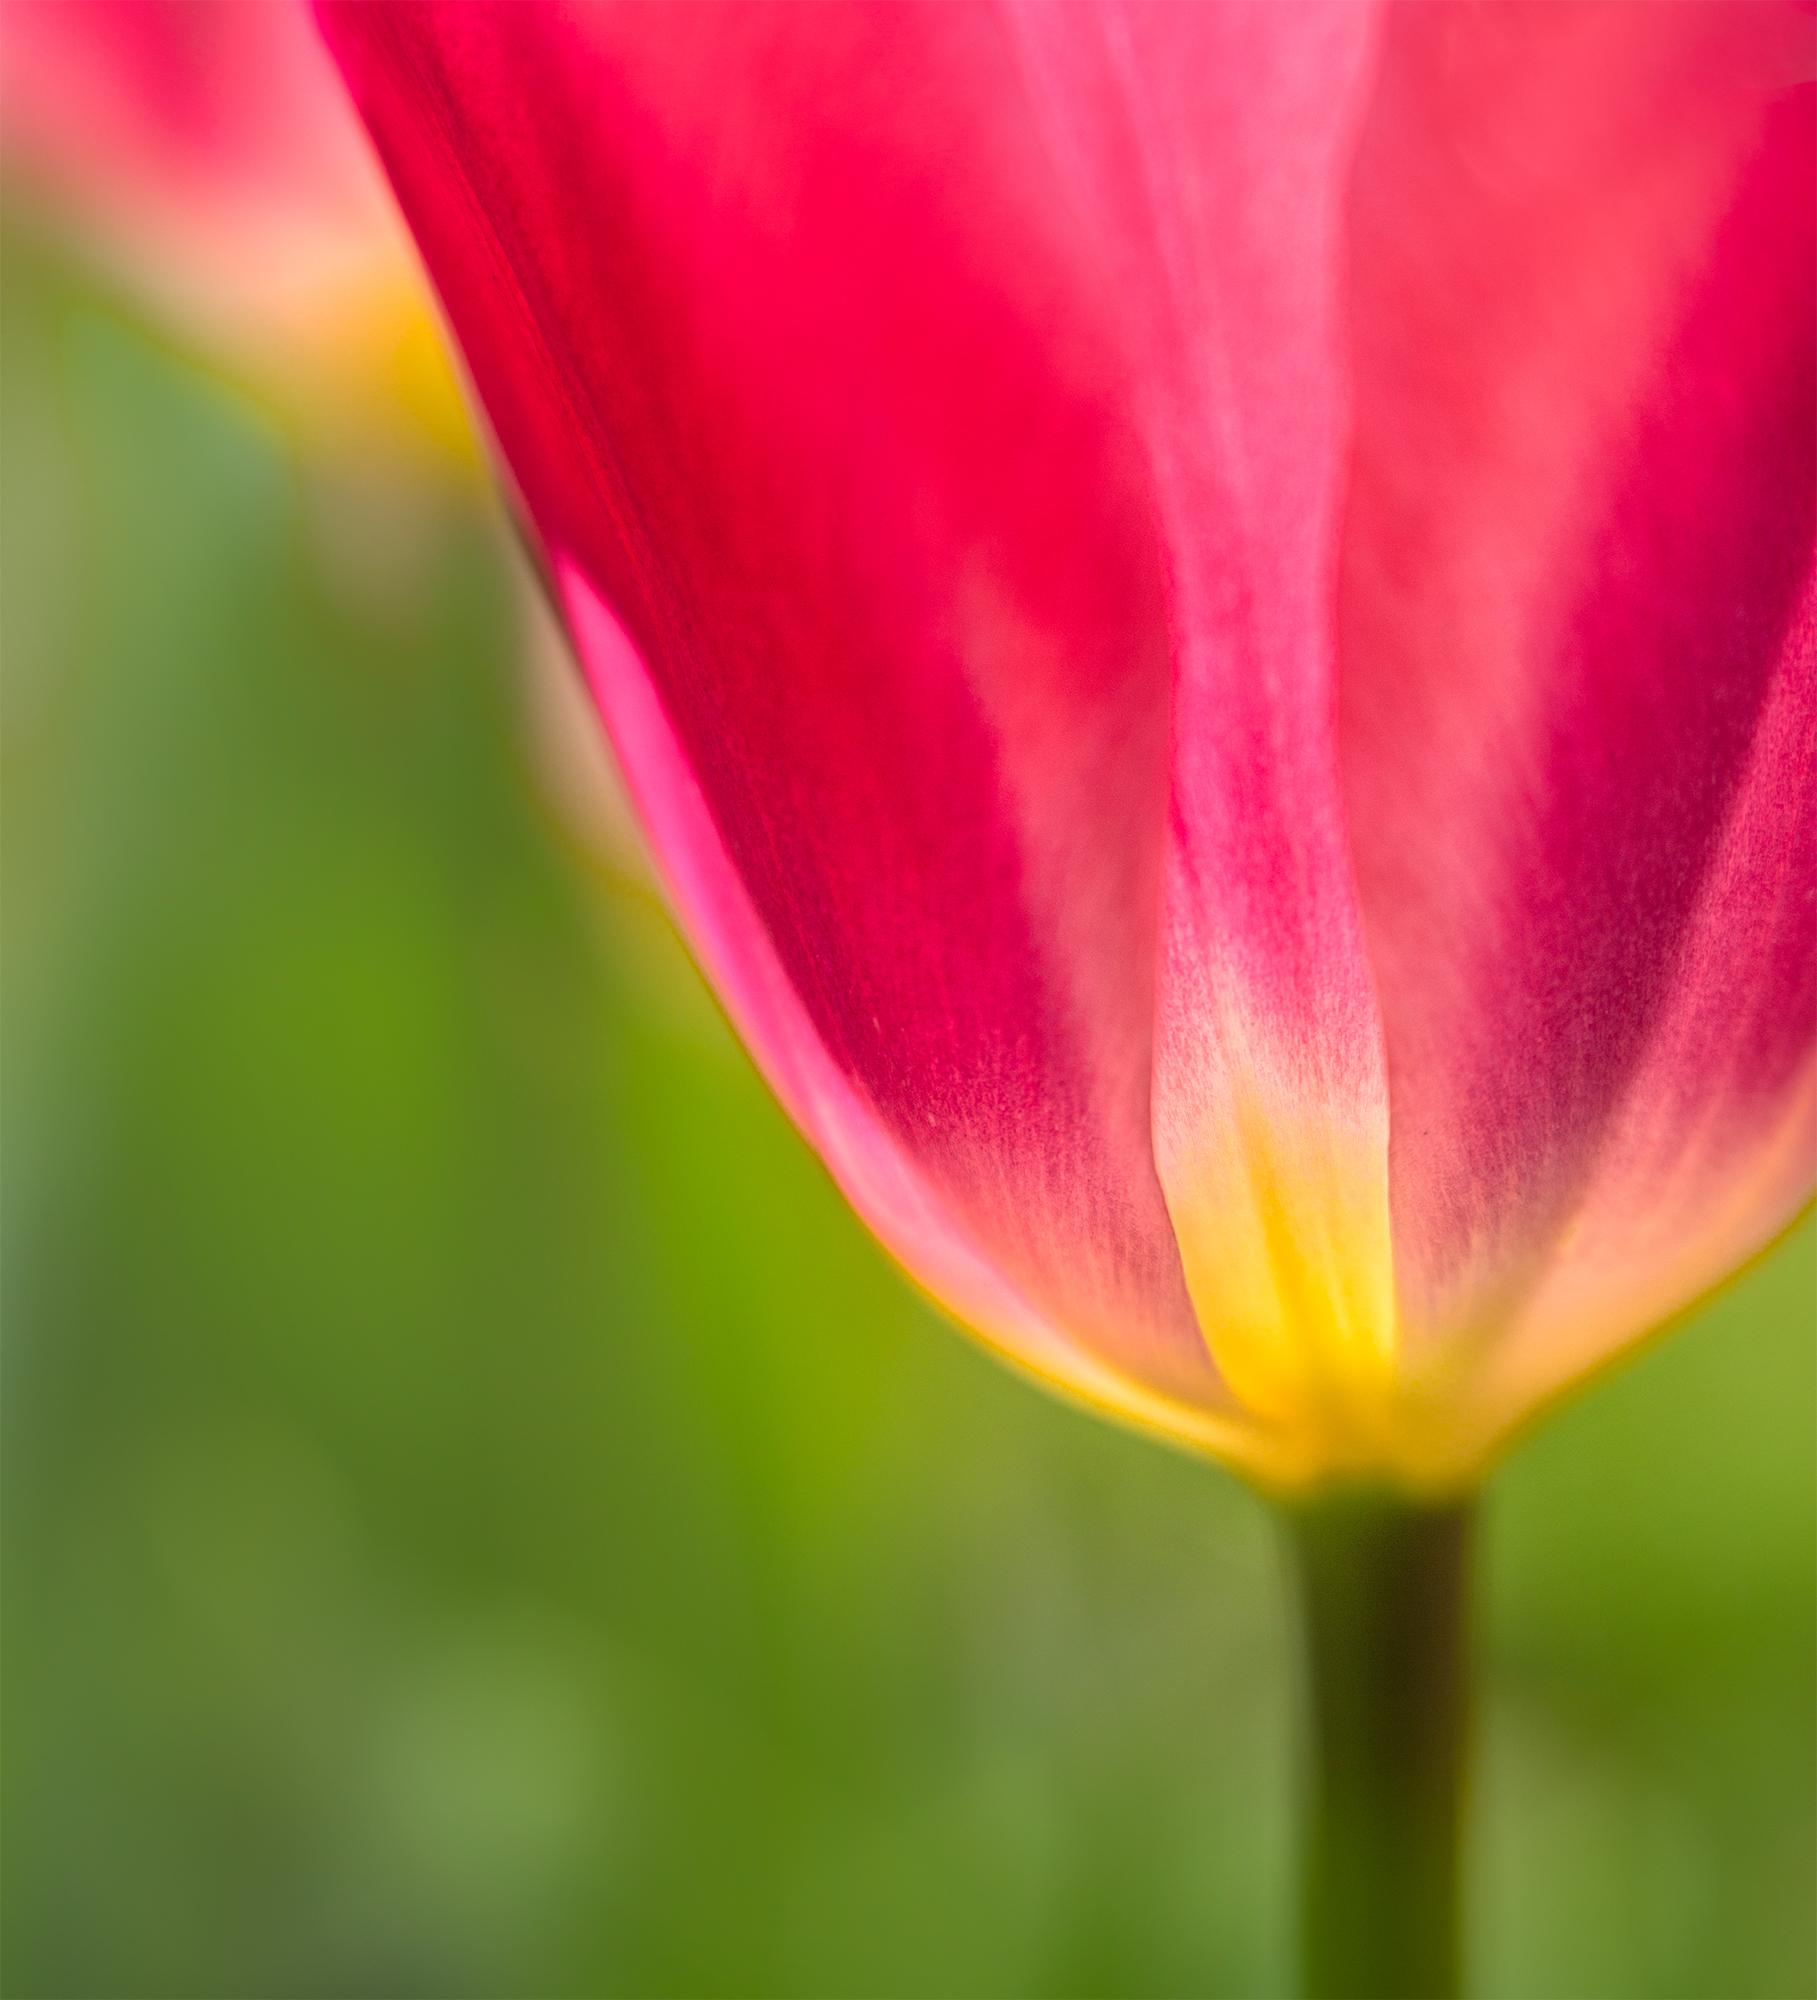 Tulip glow3-edit.jpg